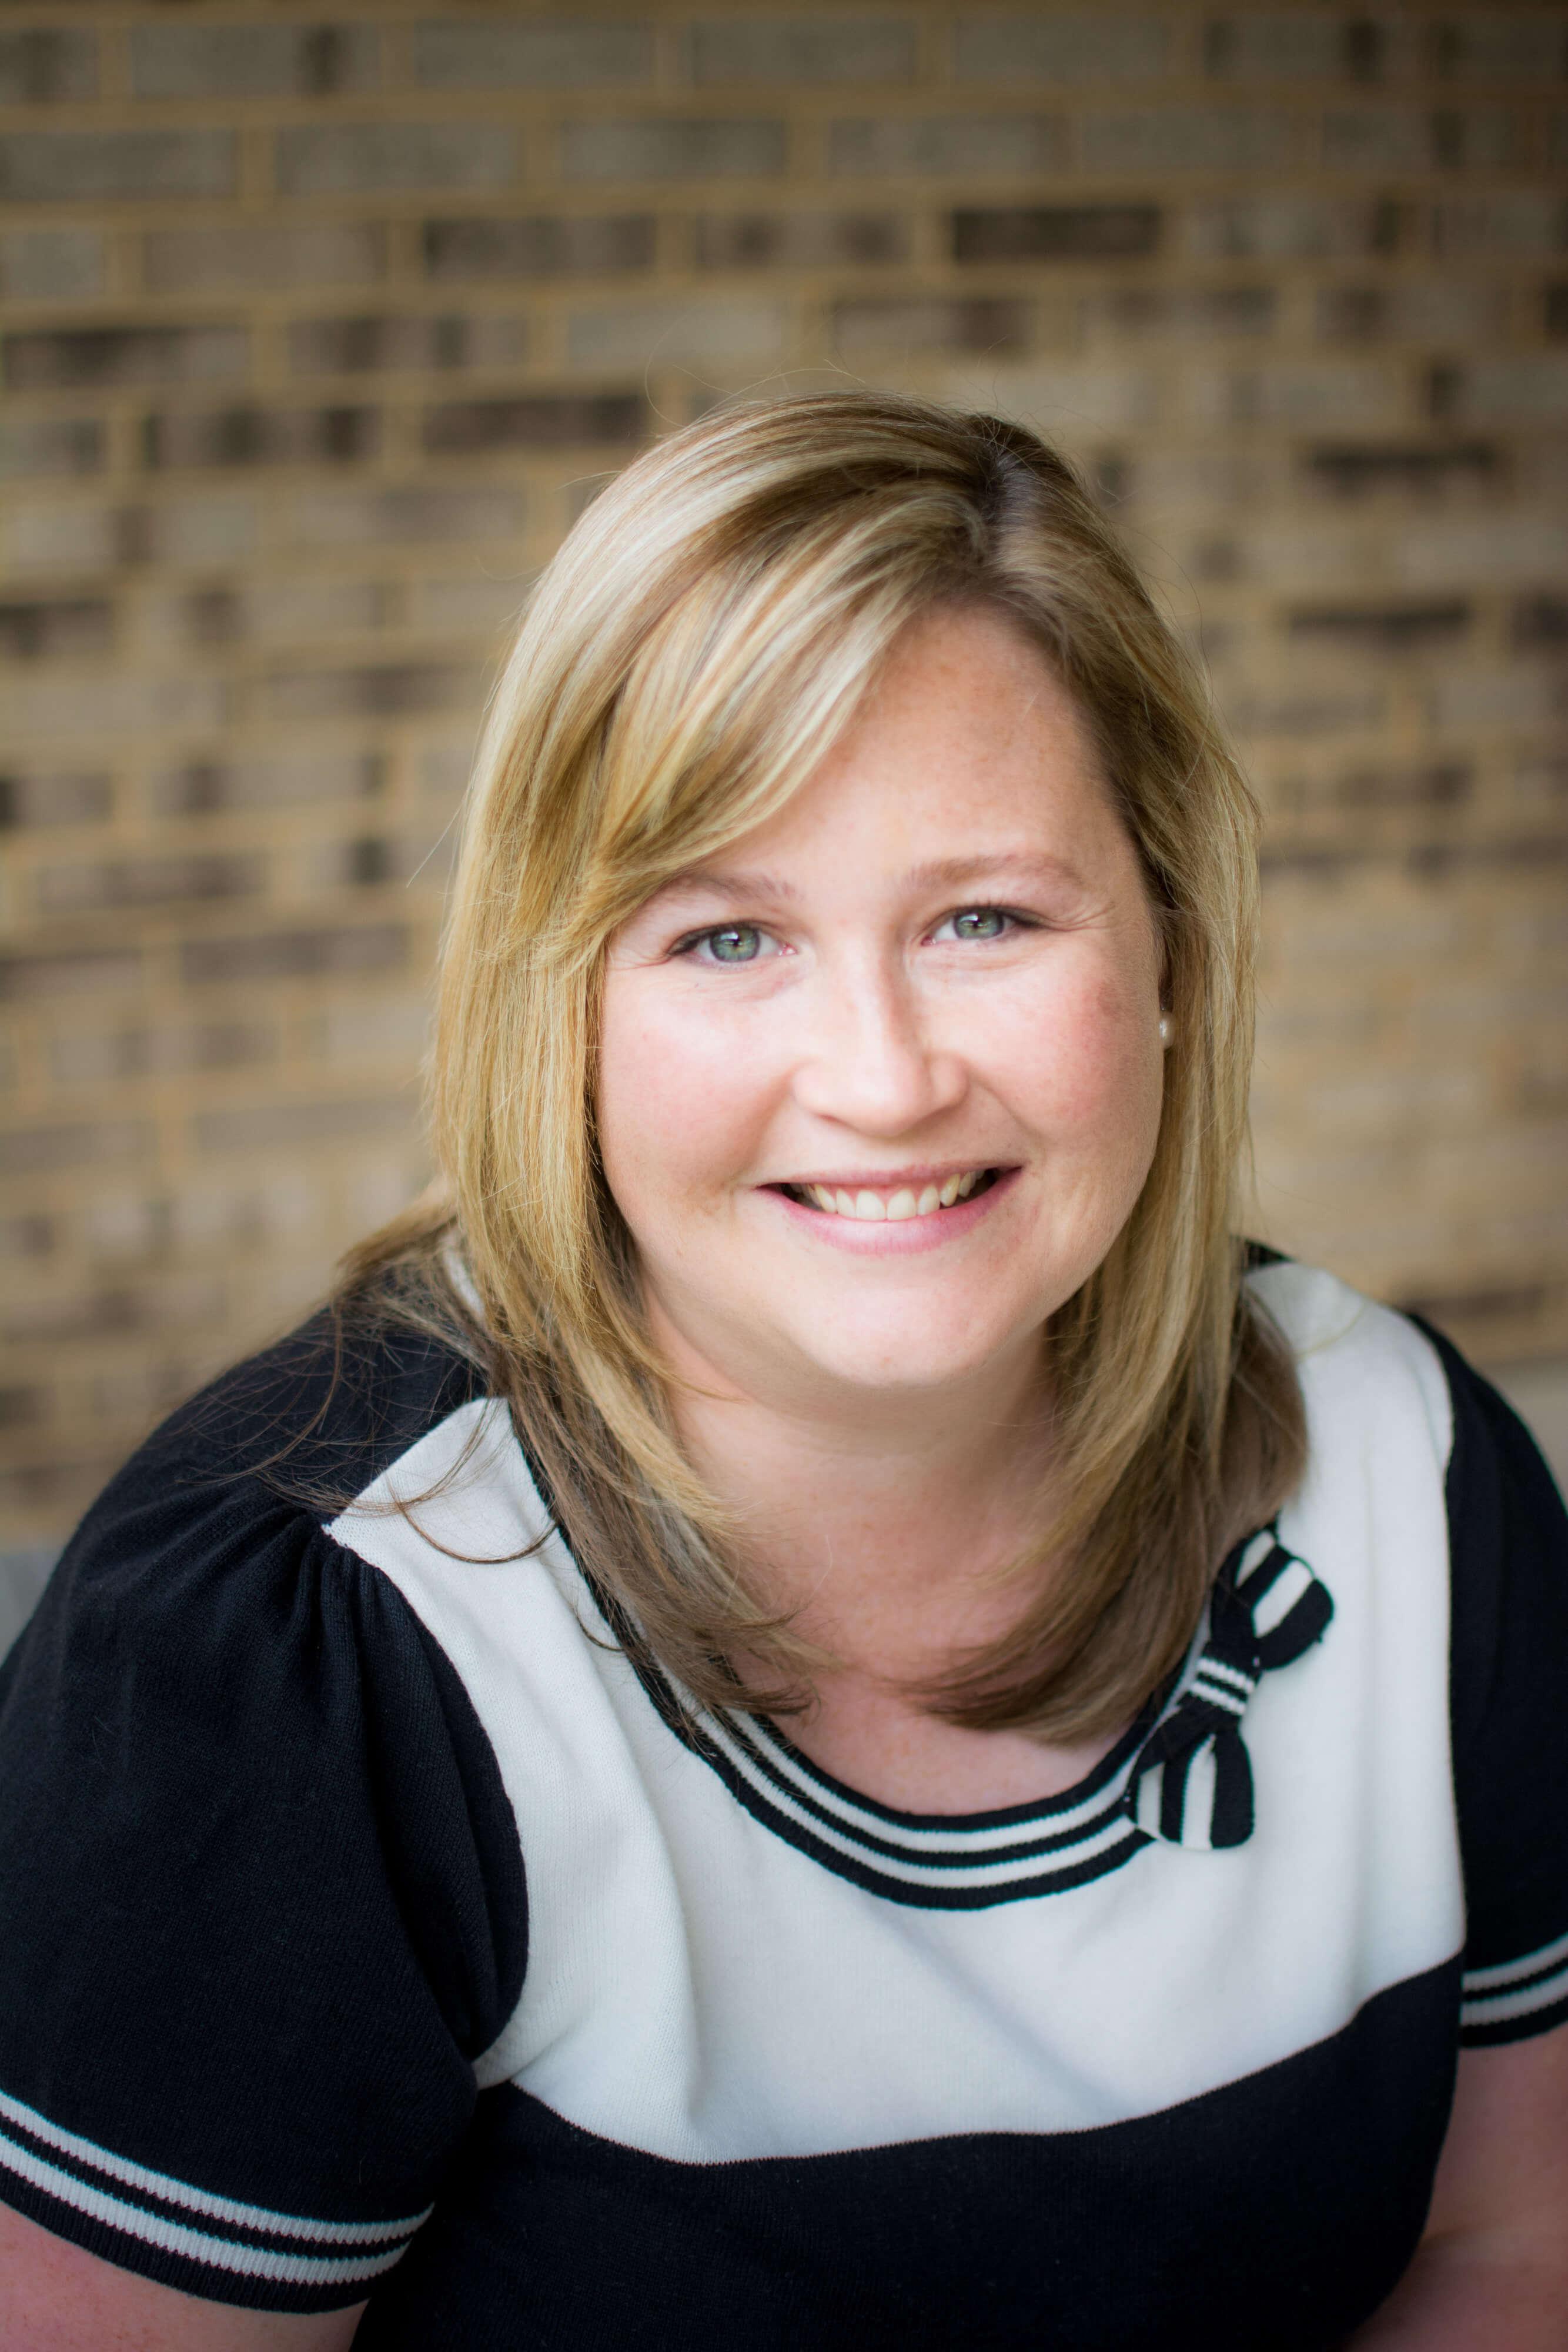 Erin Gulick